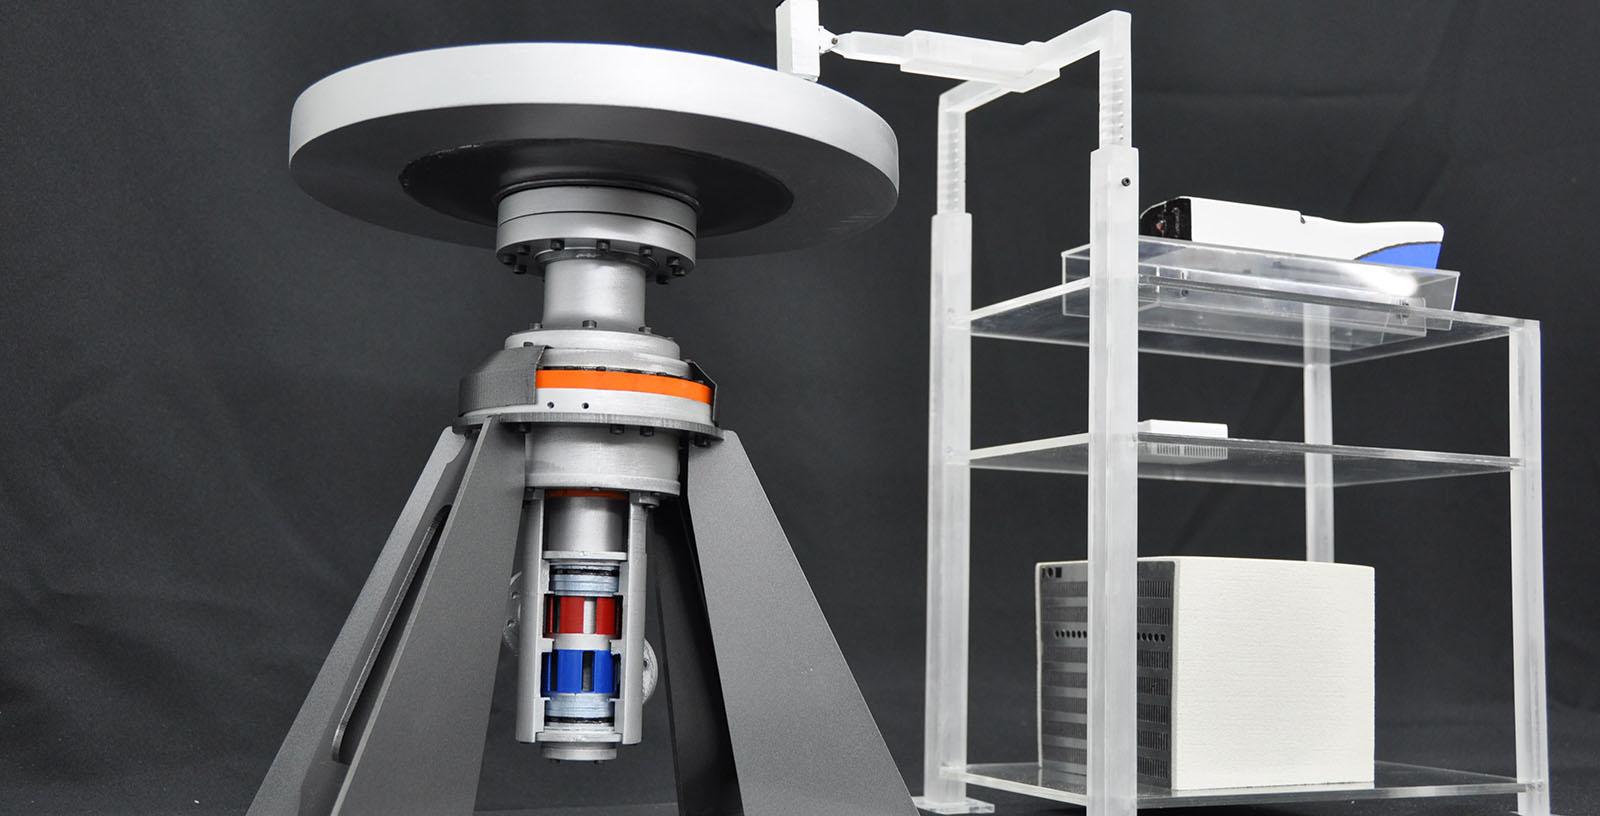 Rotating_Target_Flow_Test_Particle_Velocimetry_Bilbao_Idom_ADA